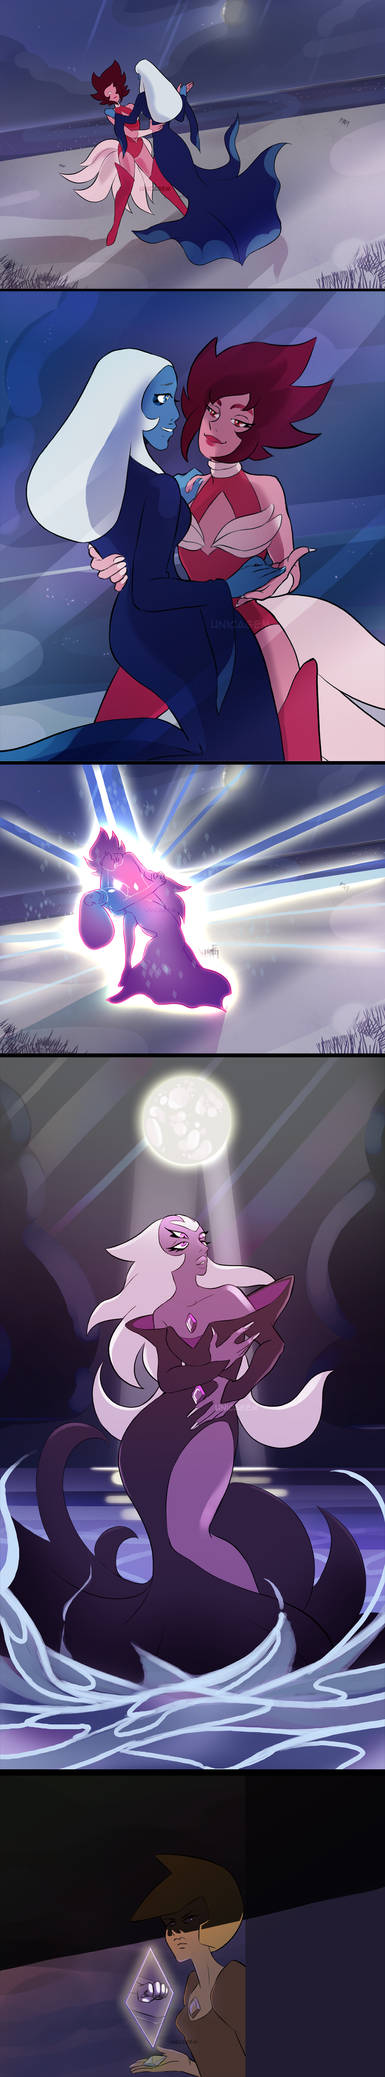 Pink and Blue fusion - PURPLE DIAMOND